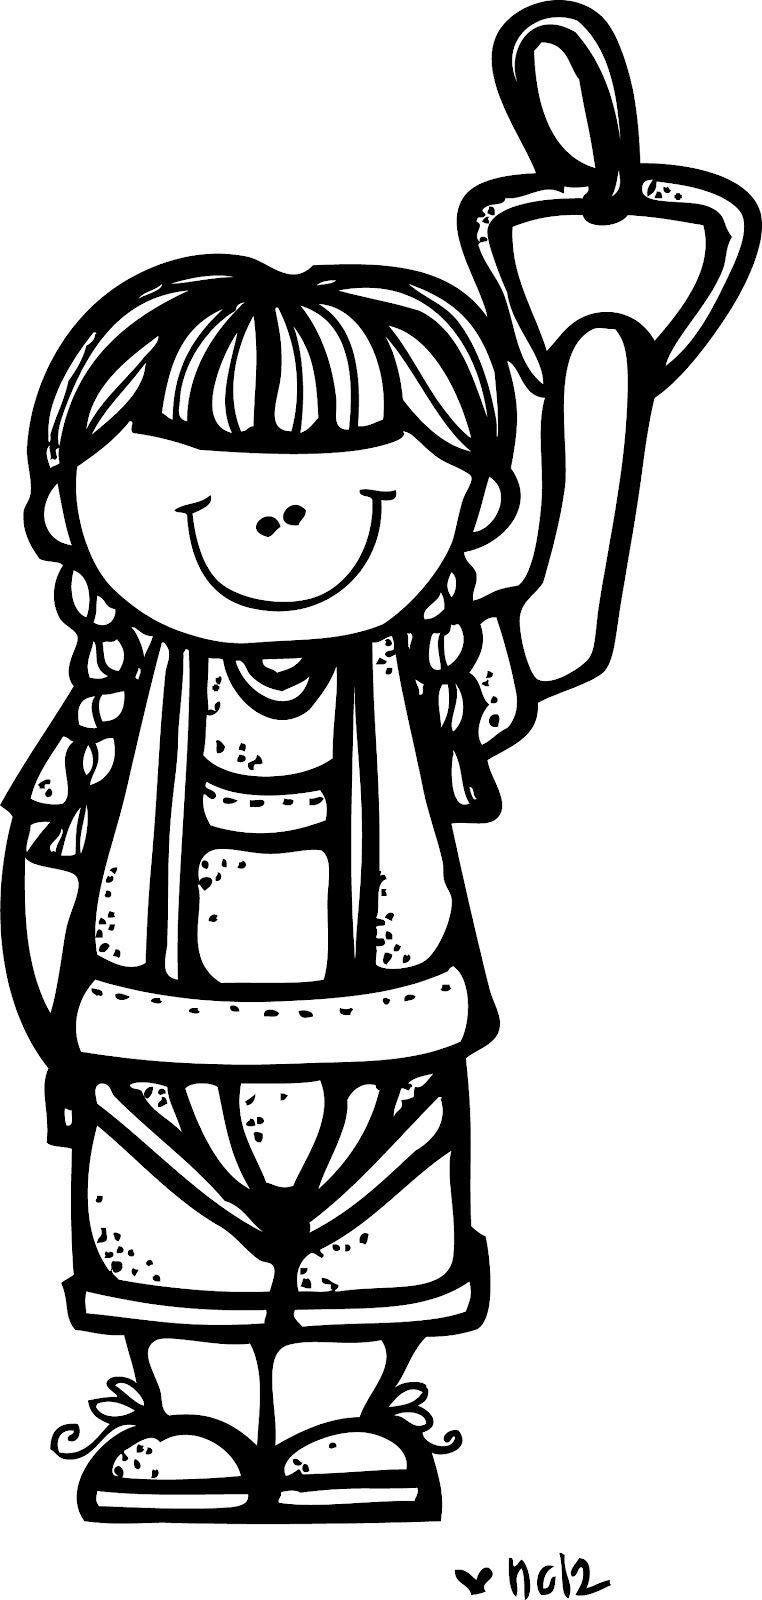 Melonheadz LDS illustrating: Girls Camp Illustrations | GS ideas ...